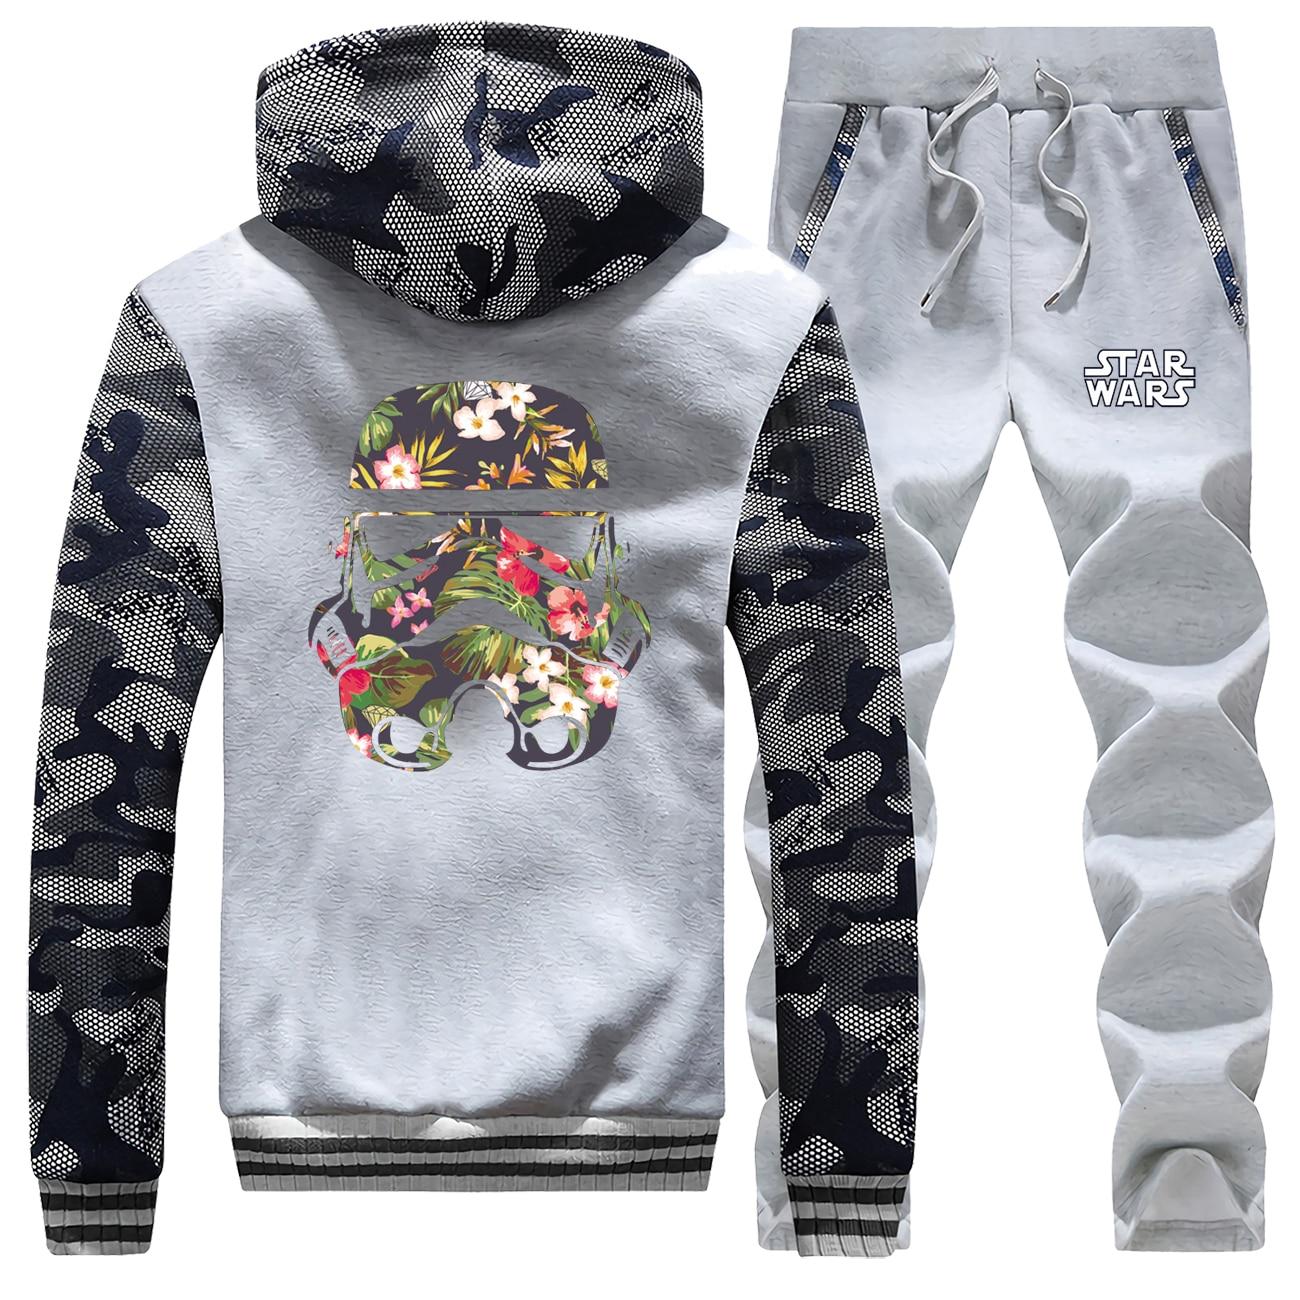 Star Wars Sportswear Sweatpants Men Darth Vader Camo Sweatshirt Hoodies Pant 2piece Sets Men Fleece Casual Harajuku Streetwear